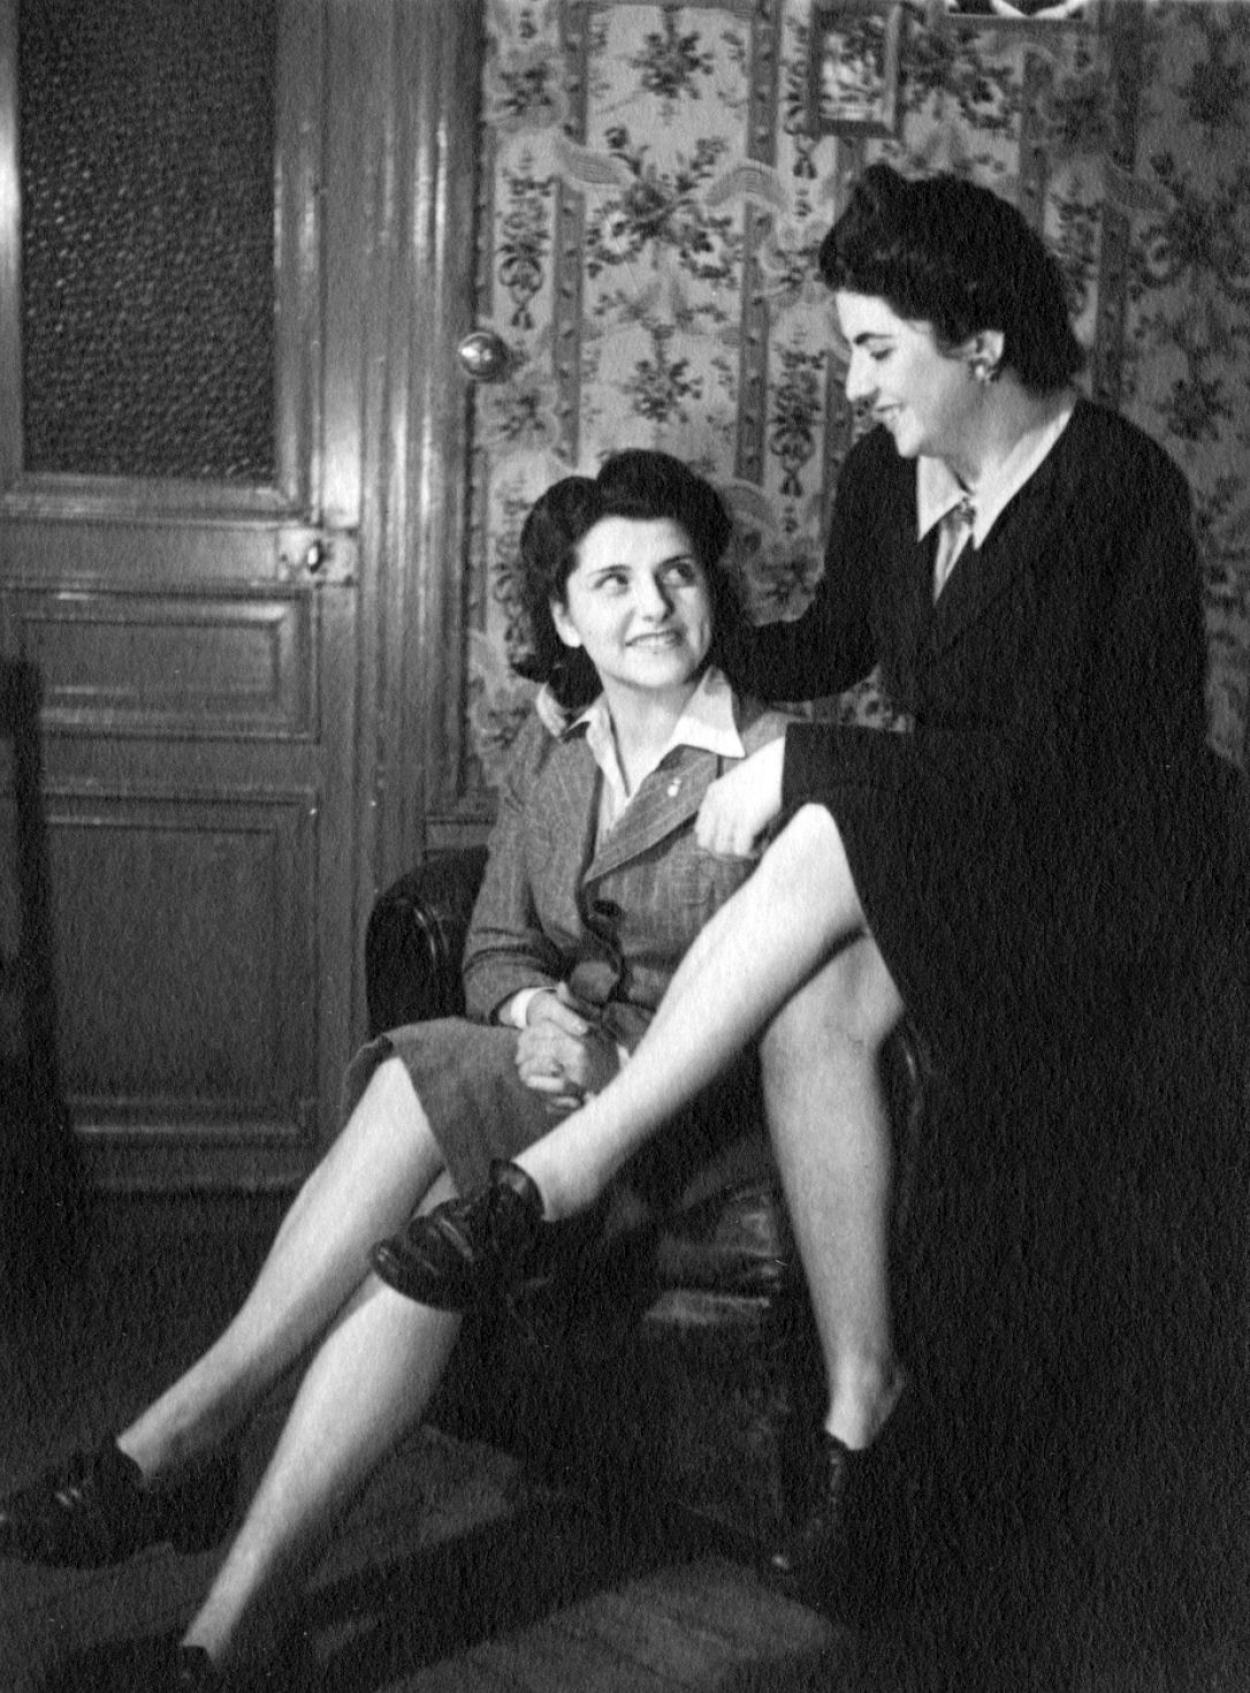 son-amie-juive-milka-avant-la-rafle-du-vel-d-hiv-en-juillet-42.jpg